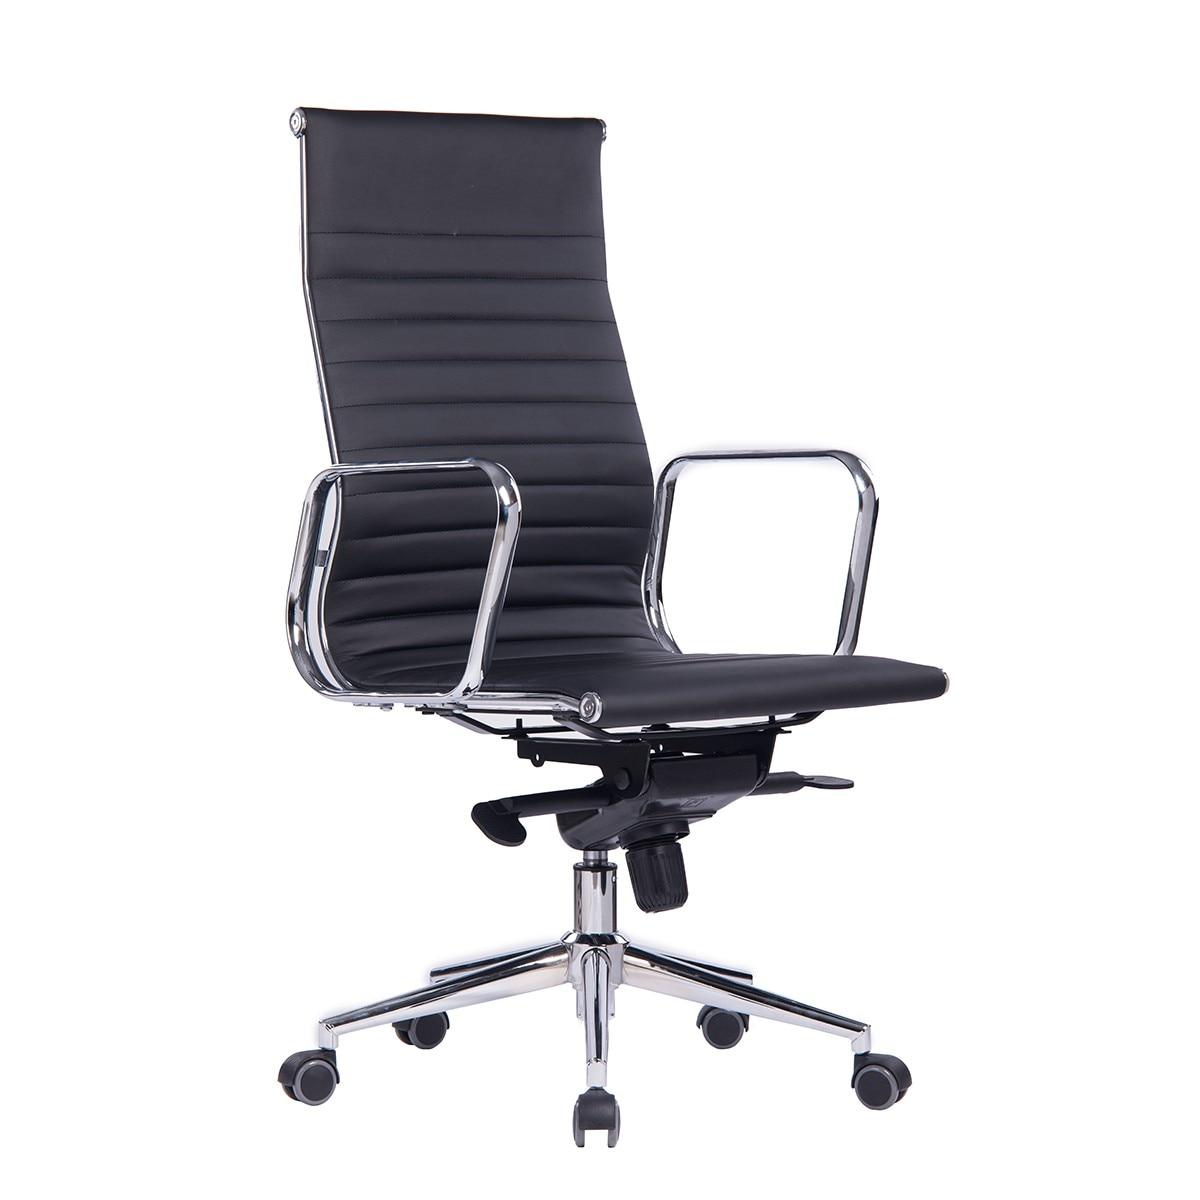 Office Armchair ARKANSAS, High, Similpiel Black